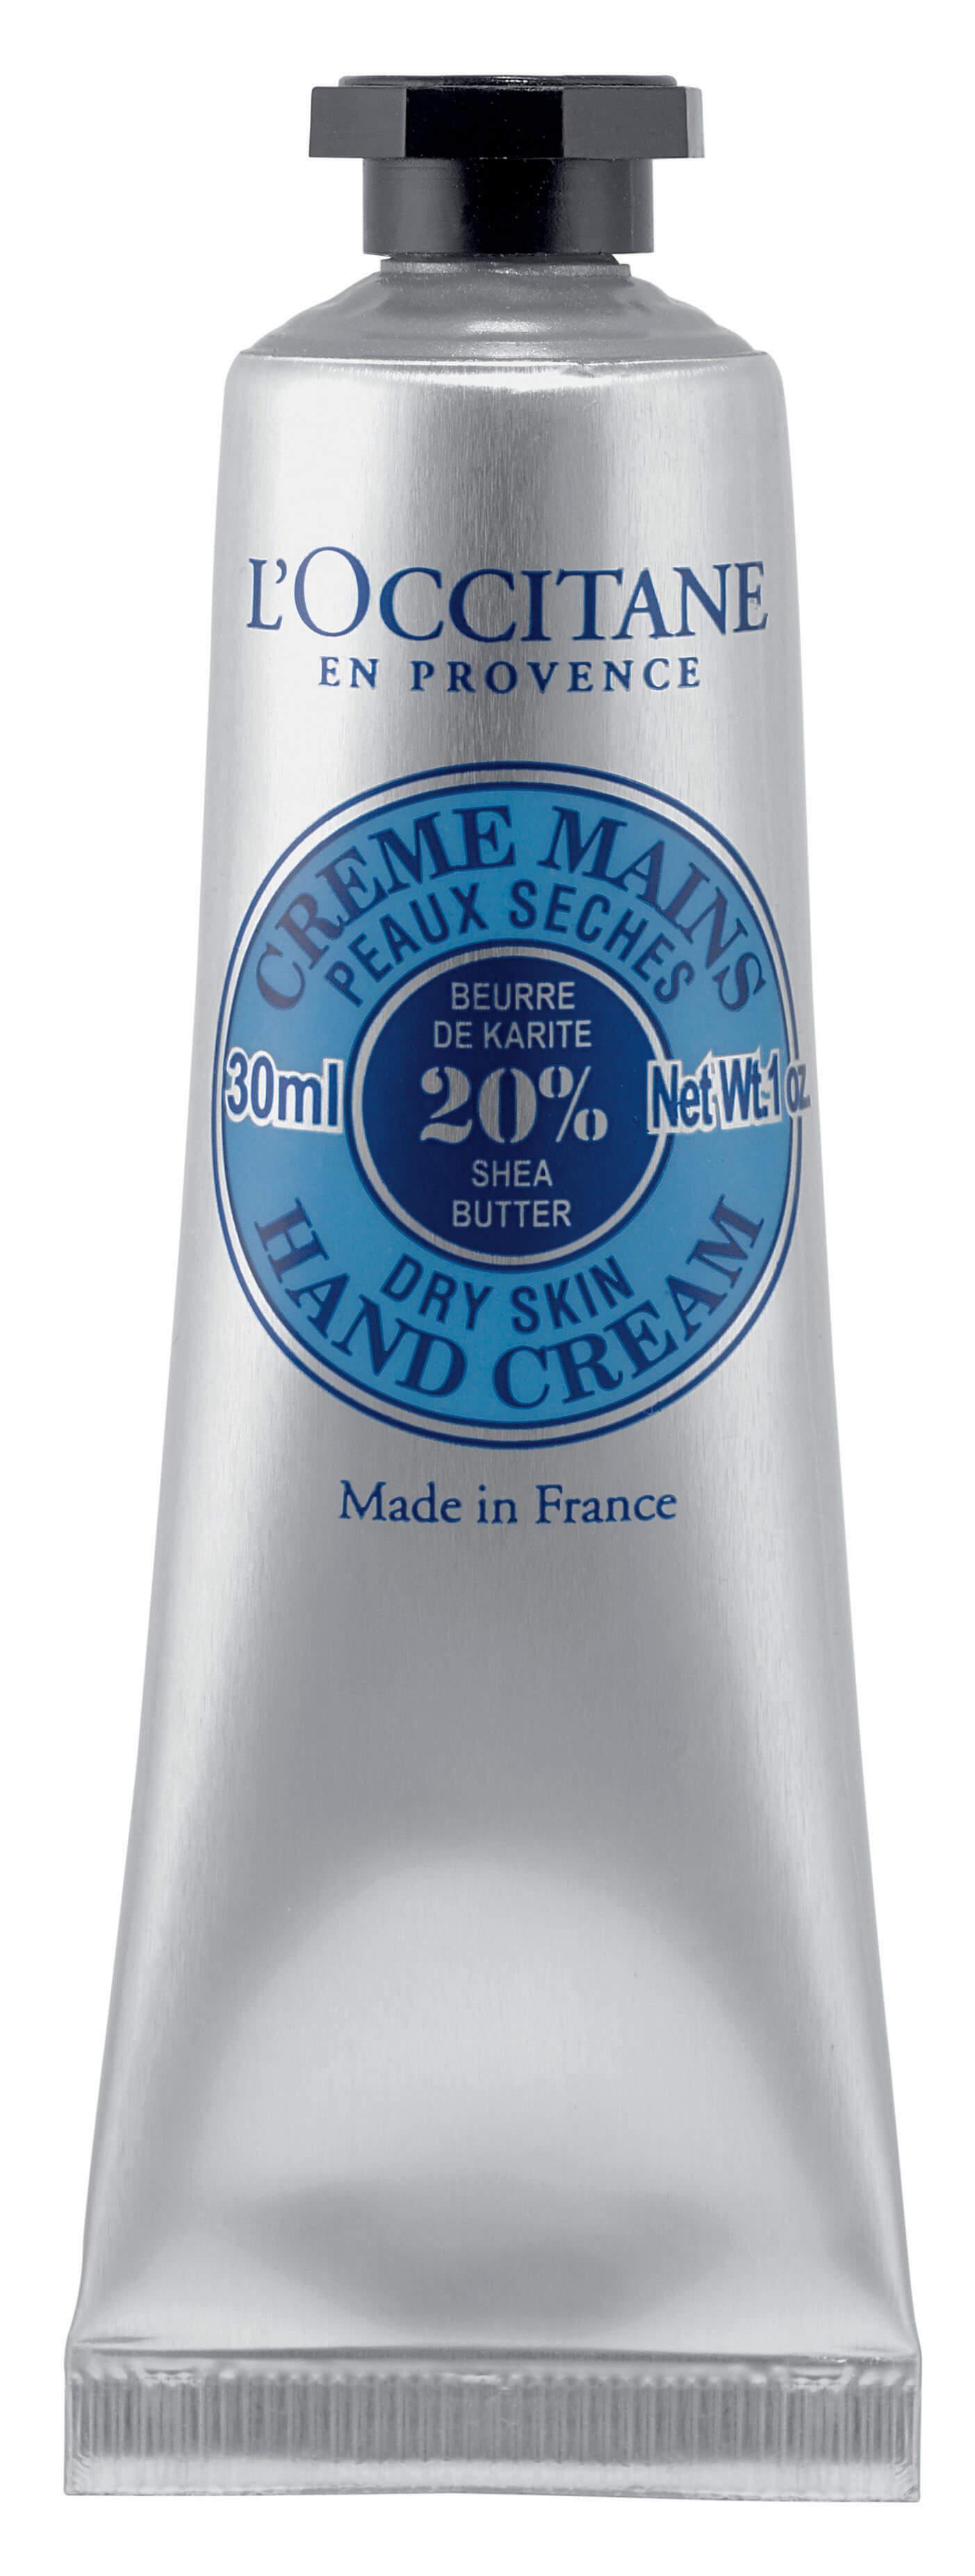 Crema mani KARITE 30ml_L'Occitane